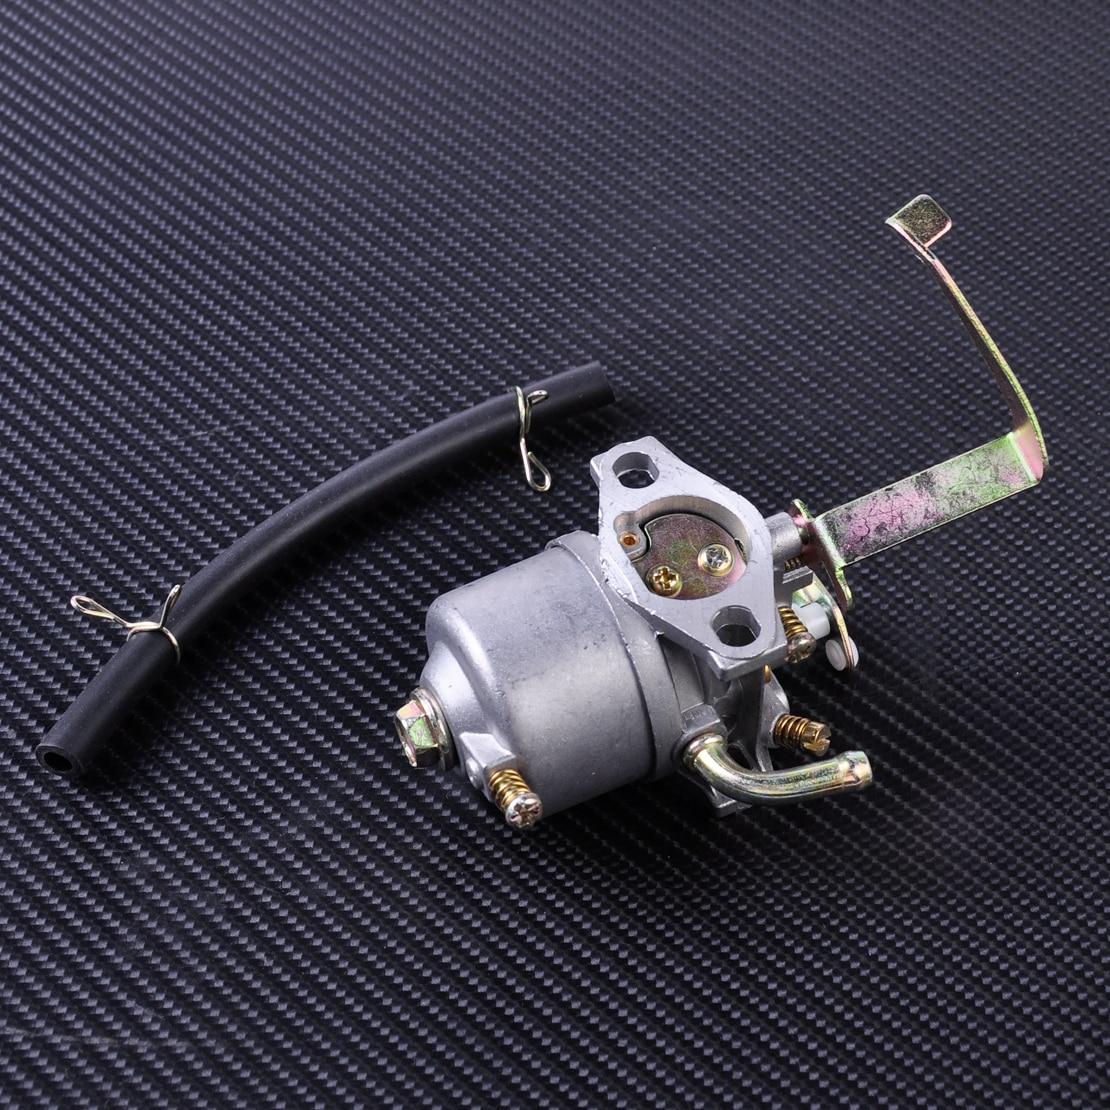 Carburetor-Hose-Set For Harbour Freight Cat 63CC 2HP Generator Replacement Part